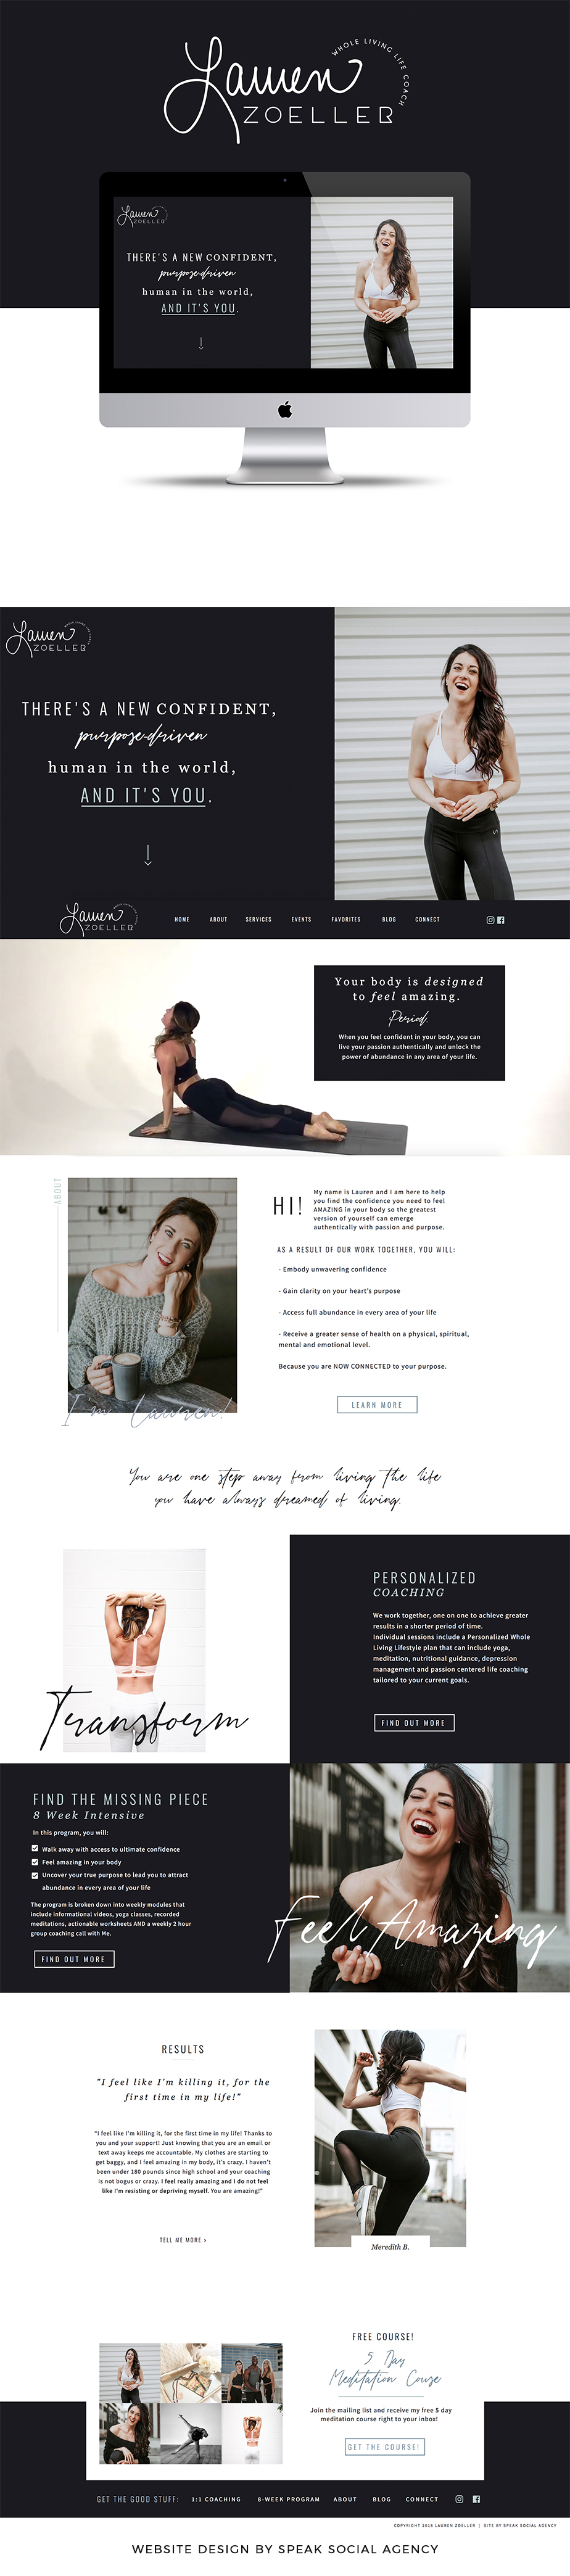 Lauren Zoeller - Website design for yoga teacher and life coach in Nashville, TN